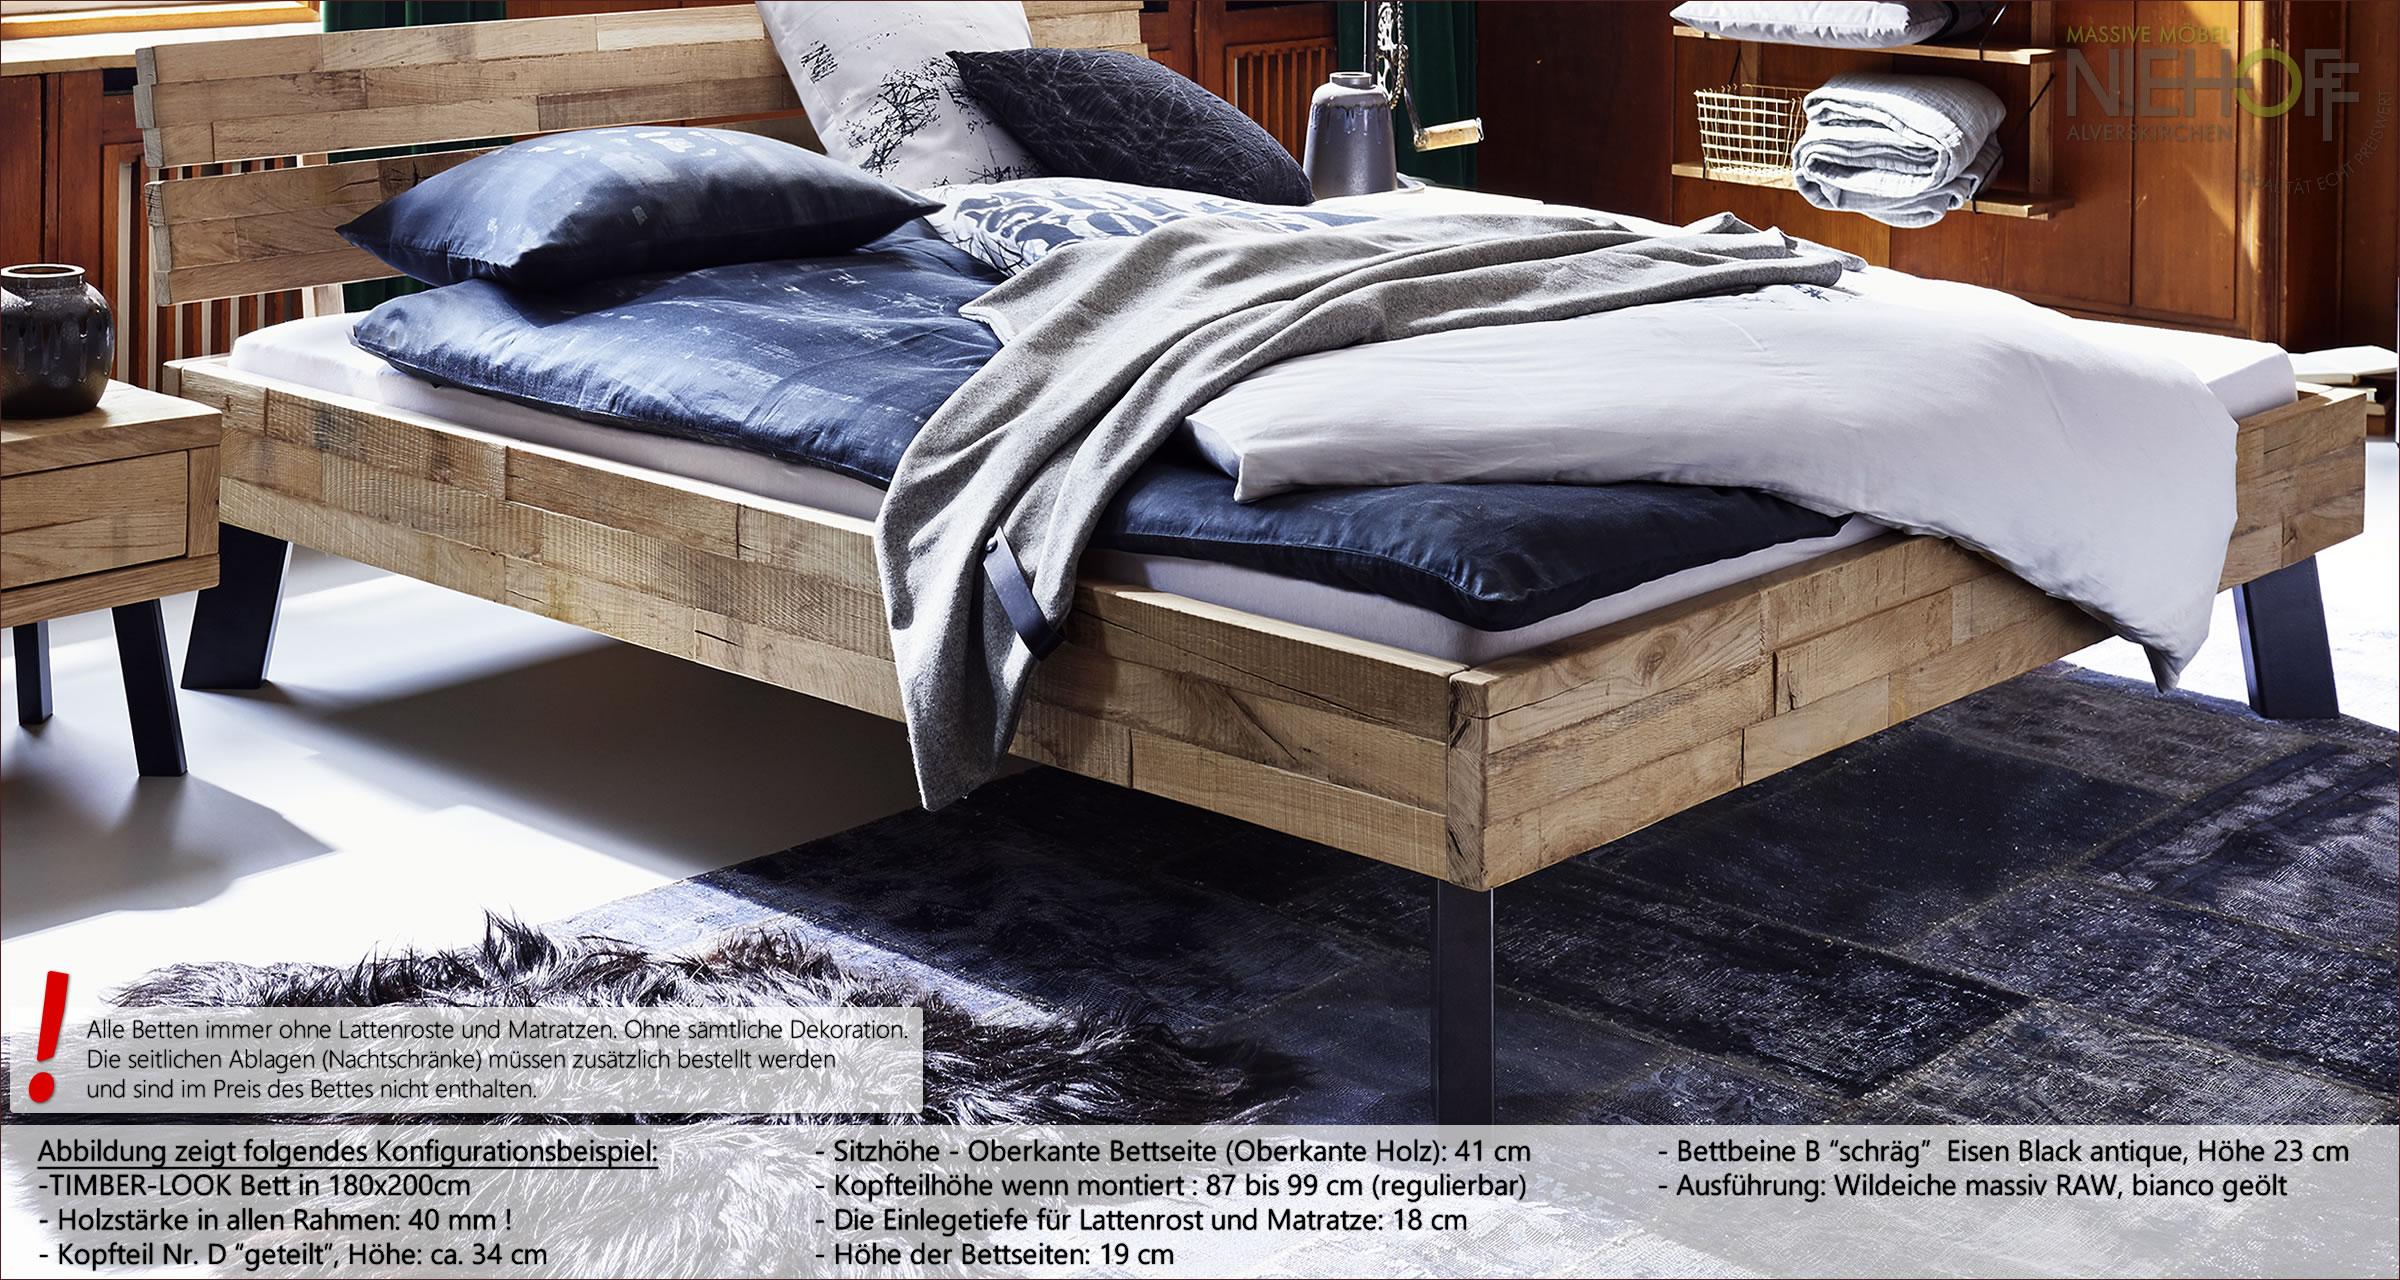 Full Size of Bett Metall Modernes Holzbett 200x200 Somnus Betten 180x200 Bette Badewanne 90x200 Mit Lattenrost Und Matratze Ruf Minion Schwarz Weiß Himmel Stauraum 160x200 Bett Bett Metall